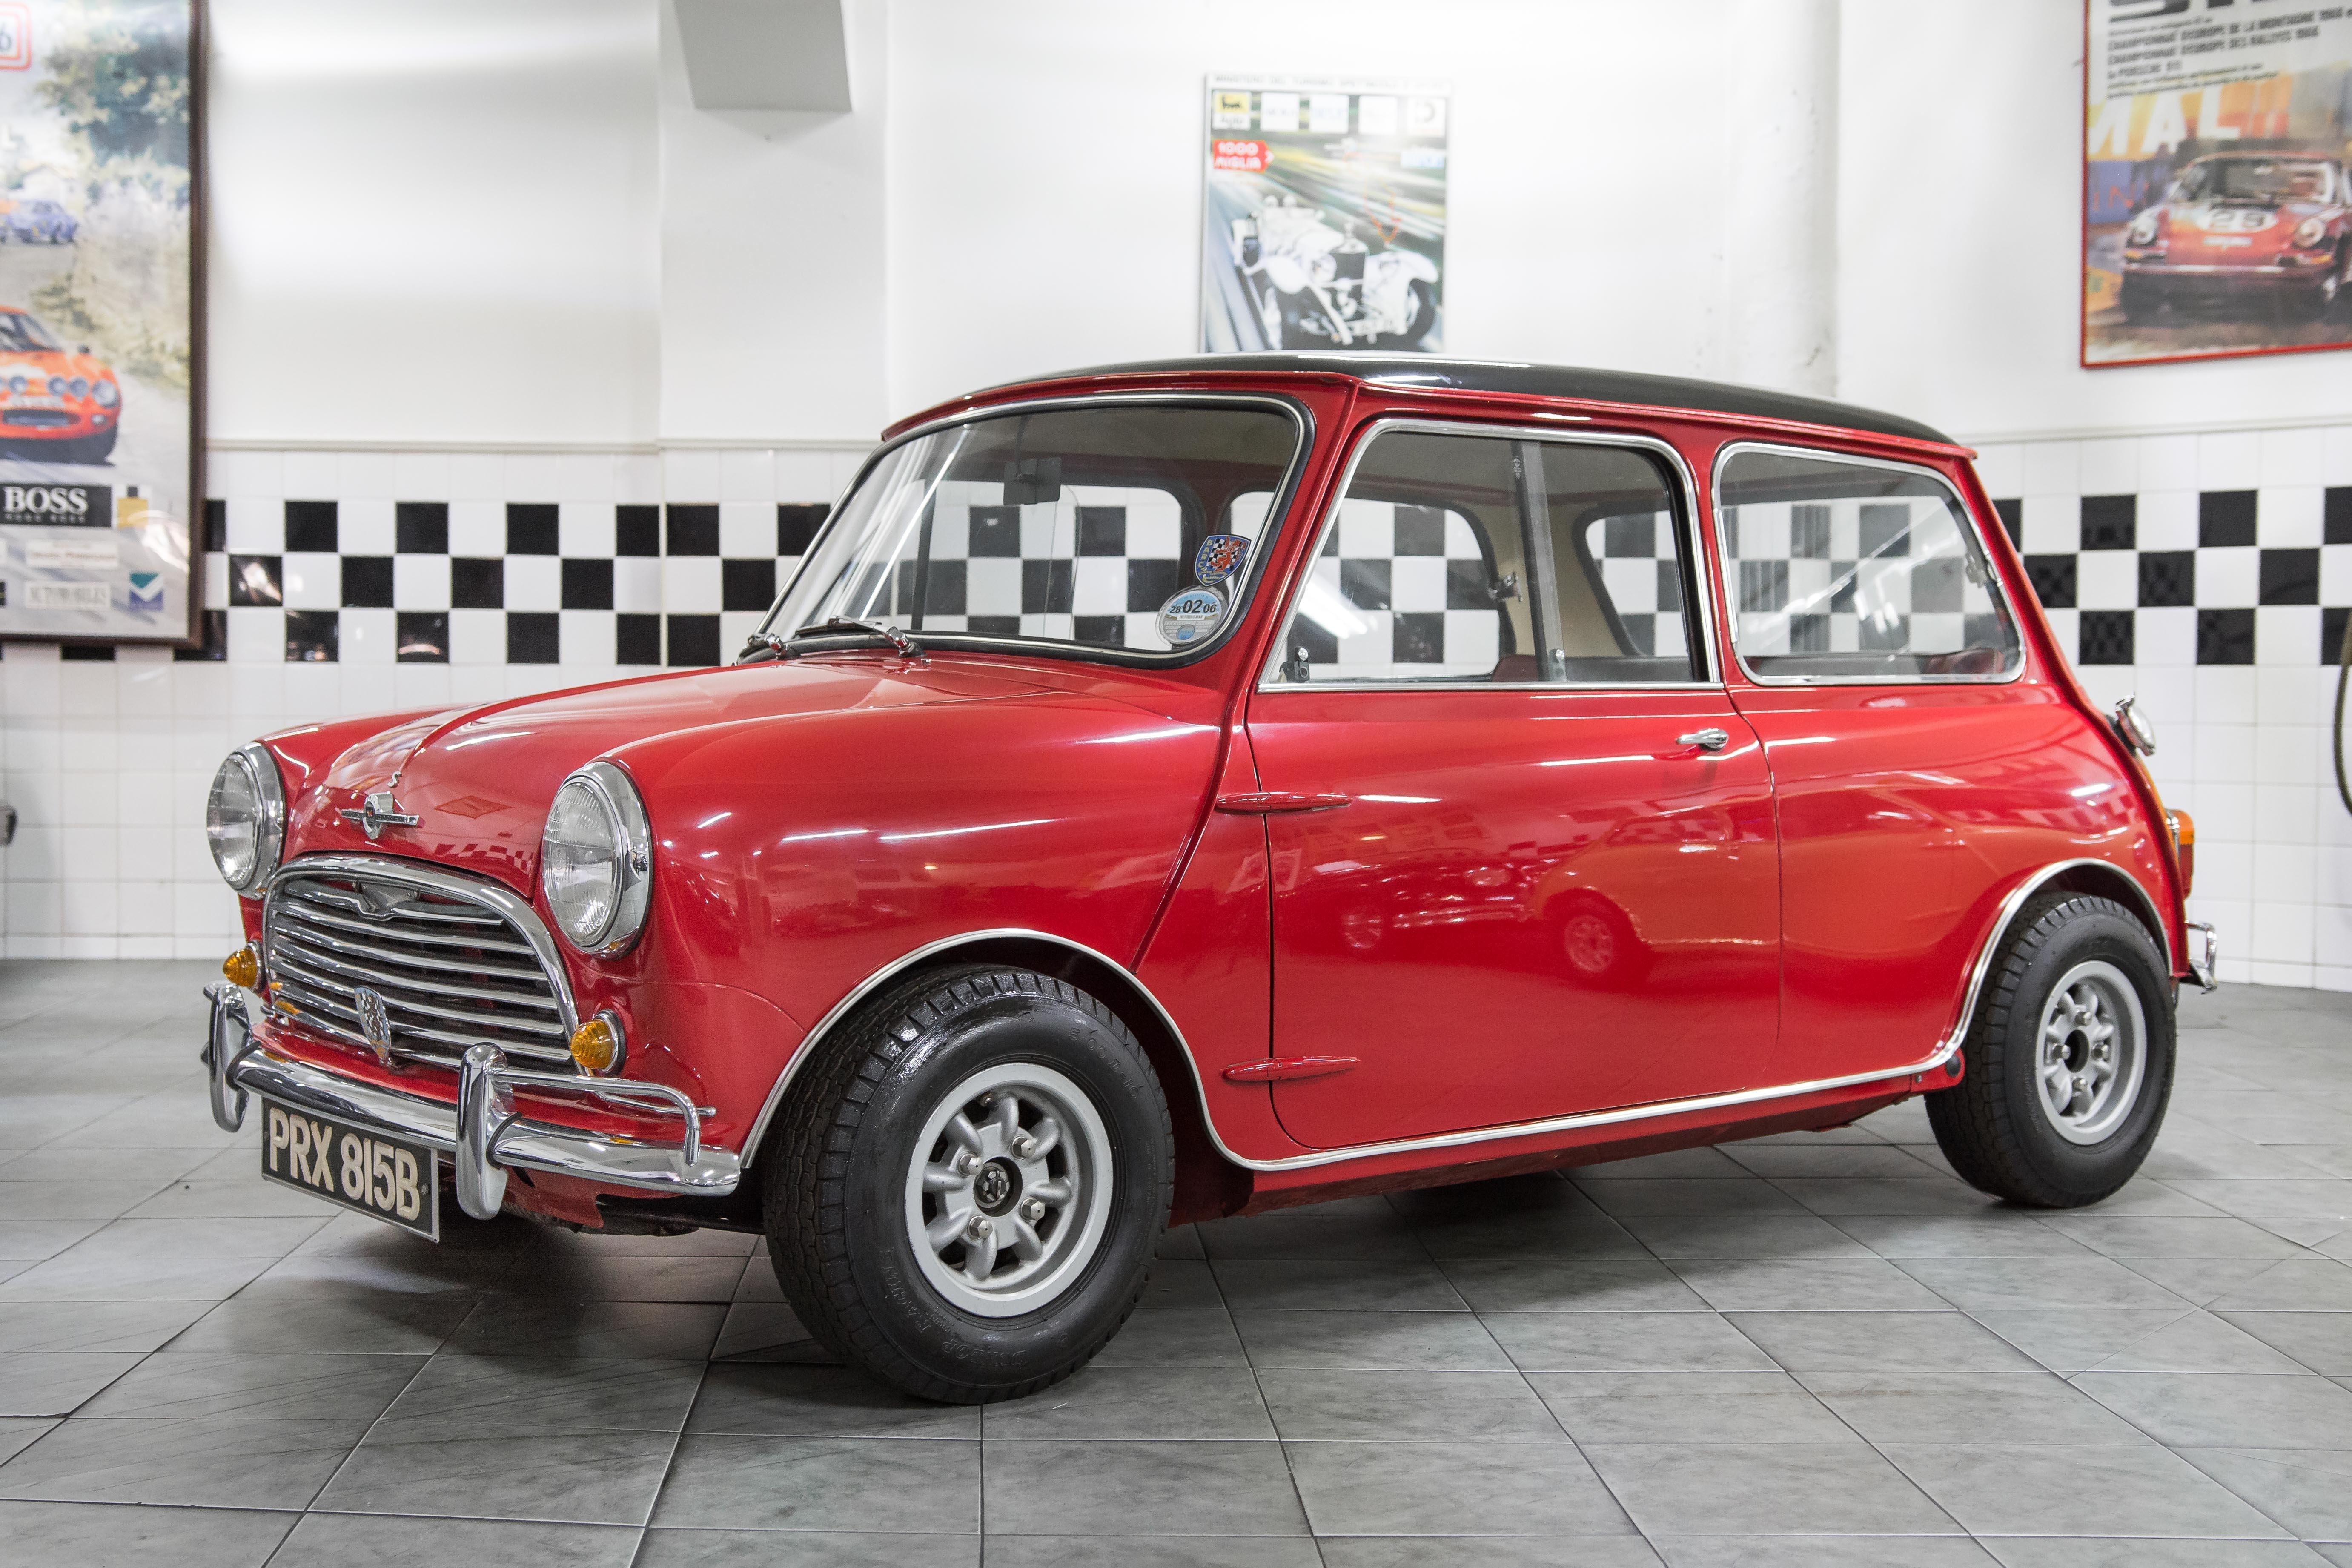 Used Car Auctions >> 1964 Morris Mini Cooper S - 970cc   Classic Driver Market